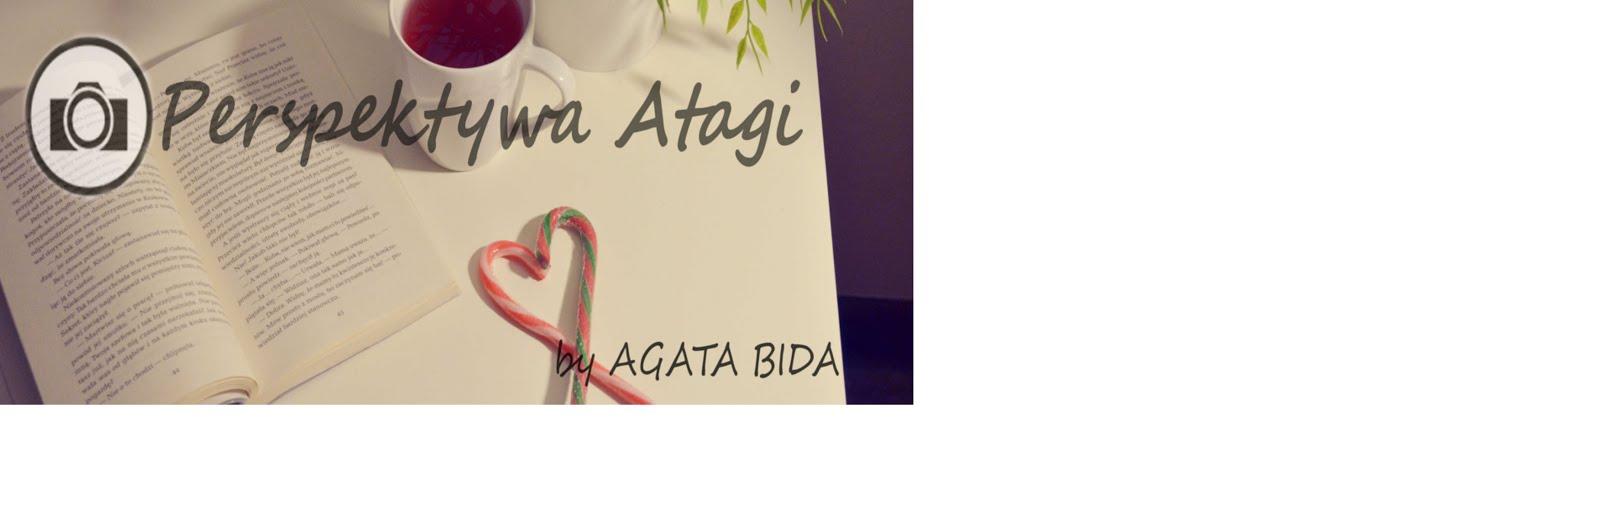 Perspektywa Atagi